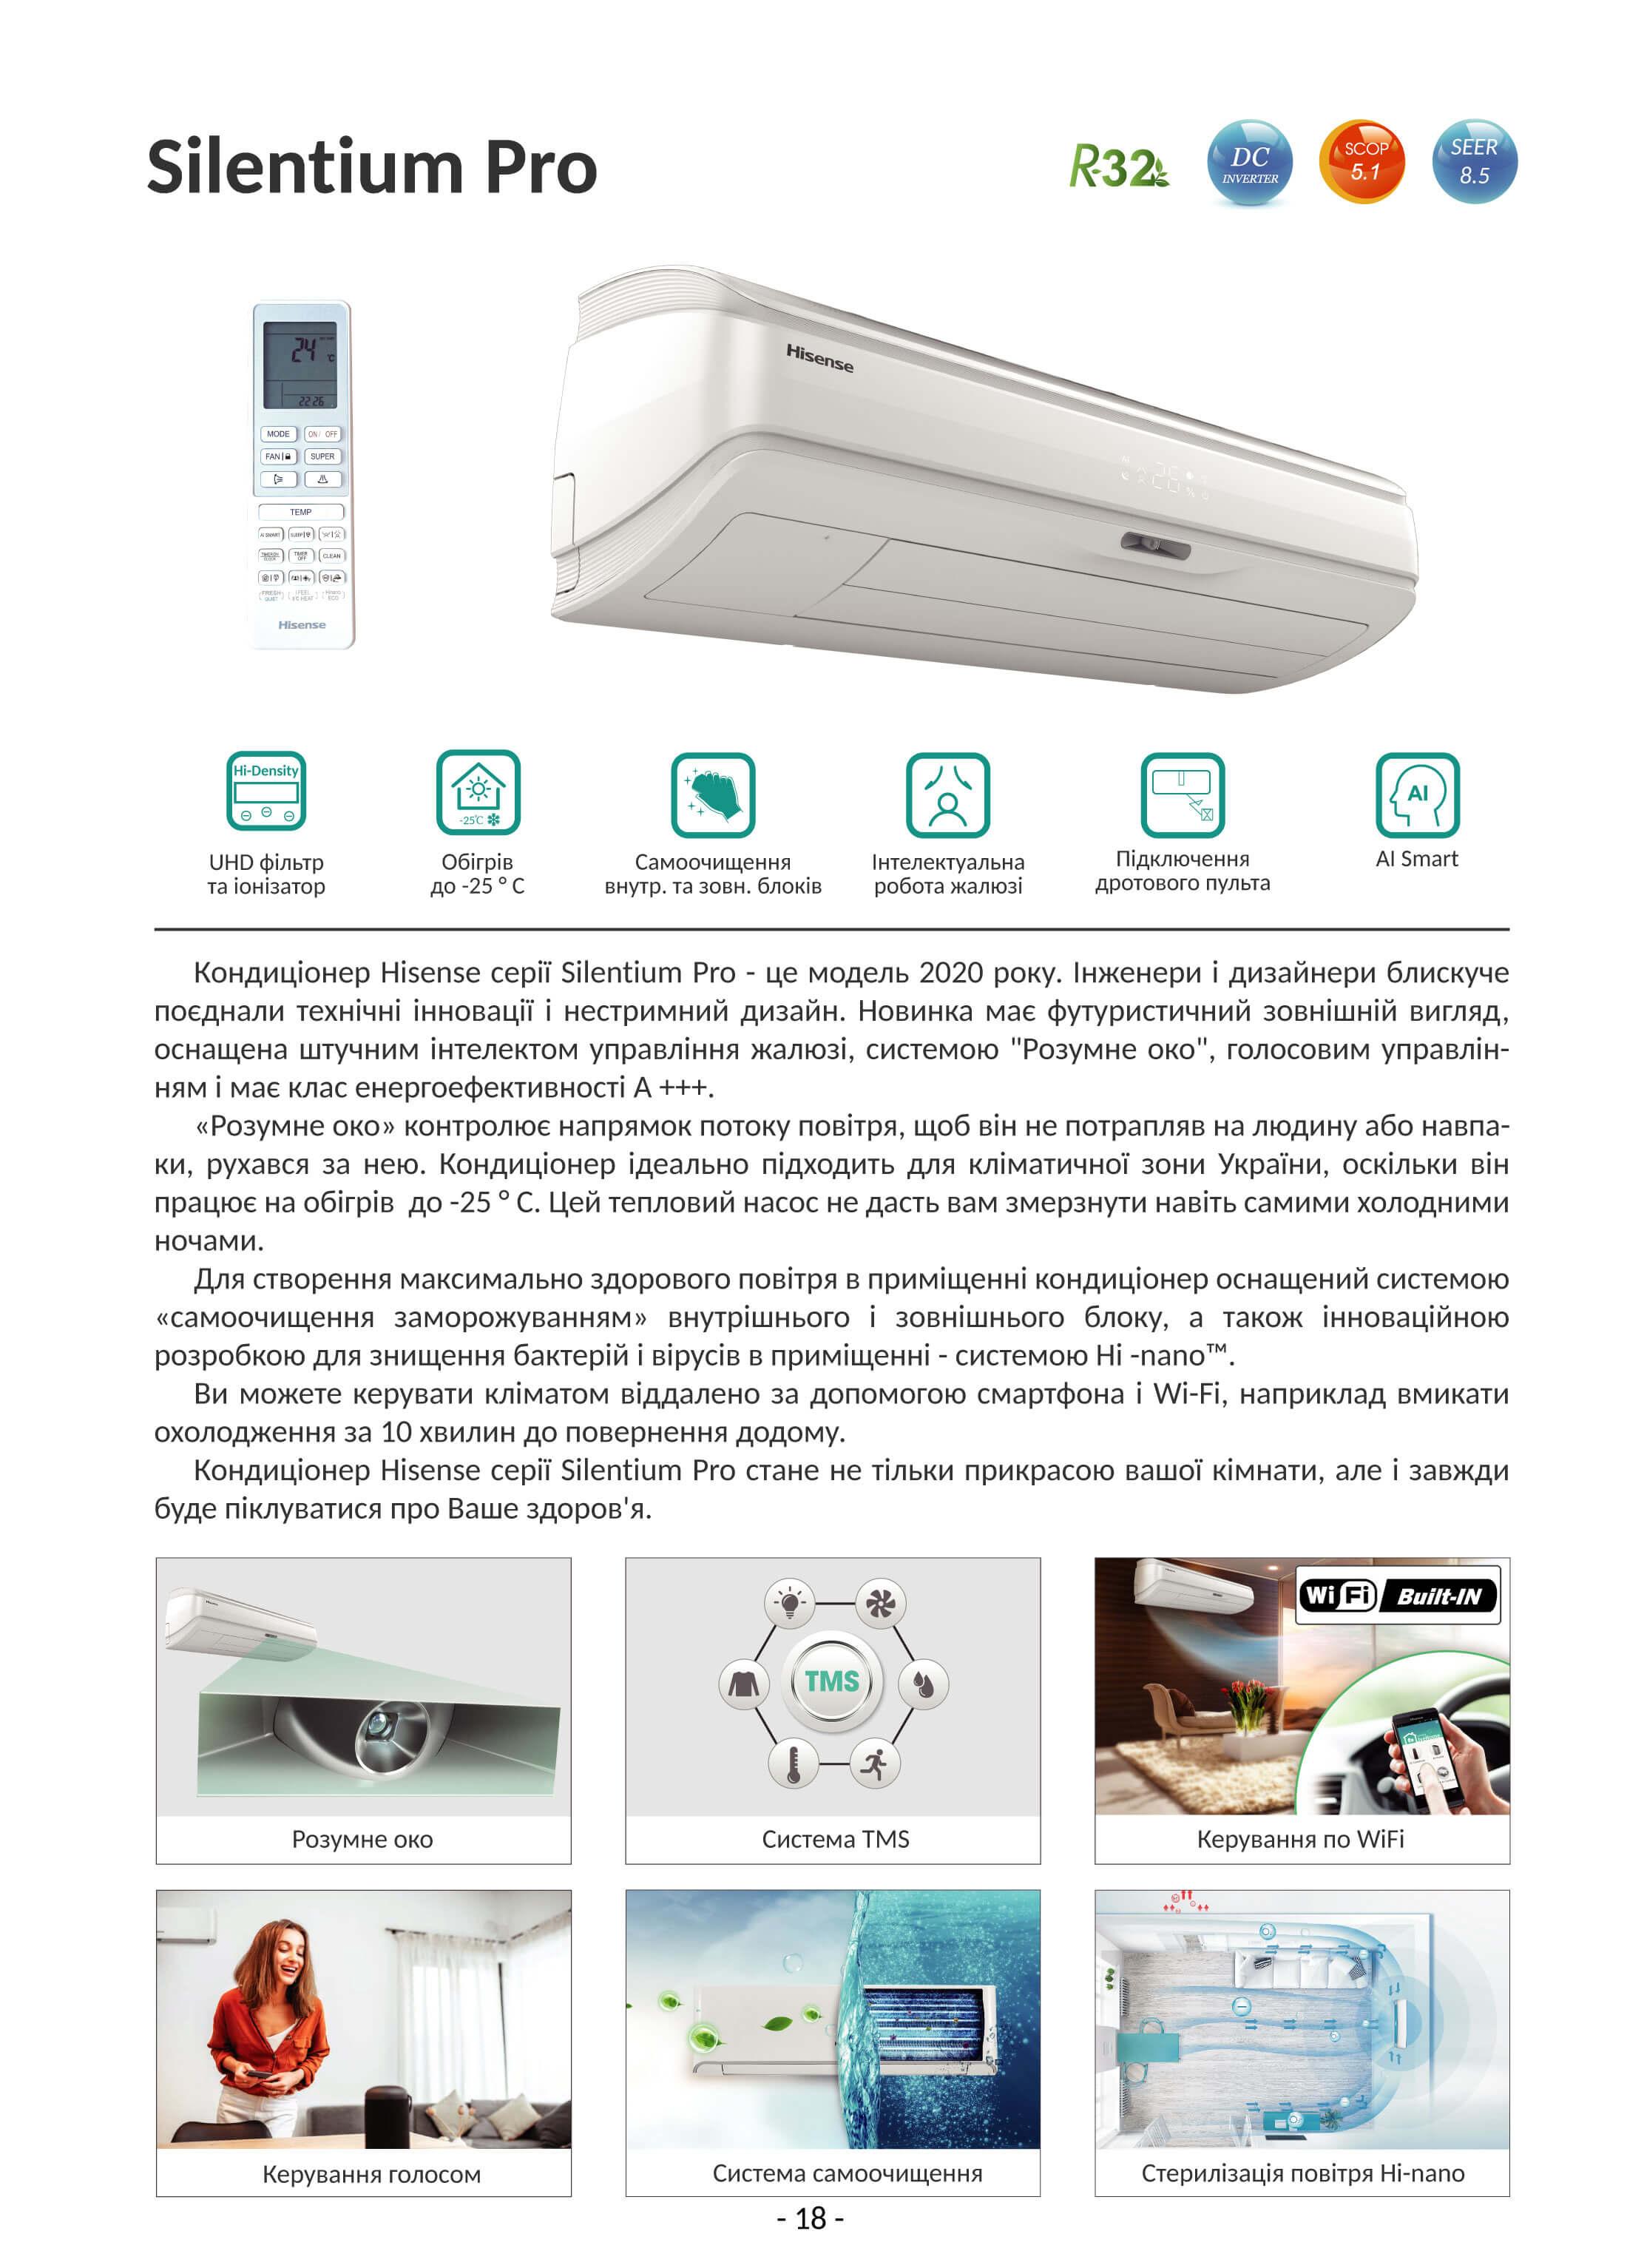 hisense Silentium Pro QD25XU0E